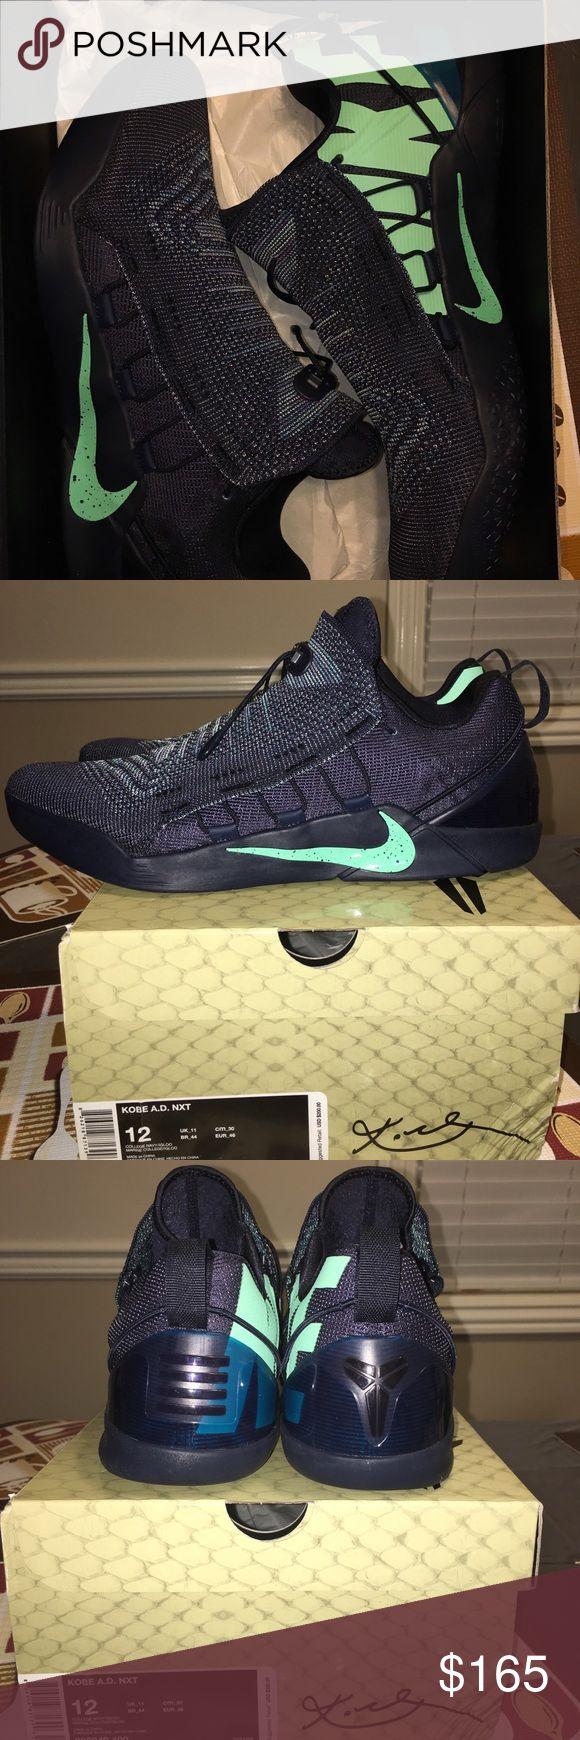 Nike Kobe AD NXT Mambacurial Kobe Bryant Size 12 Nike Kobe AD NXT Mambacurial College Navy Size 12 Mamba Kobe Bryant Basketball Sneakers NEW IN BOX RETAIL $230 Nike Shoes Sneakers